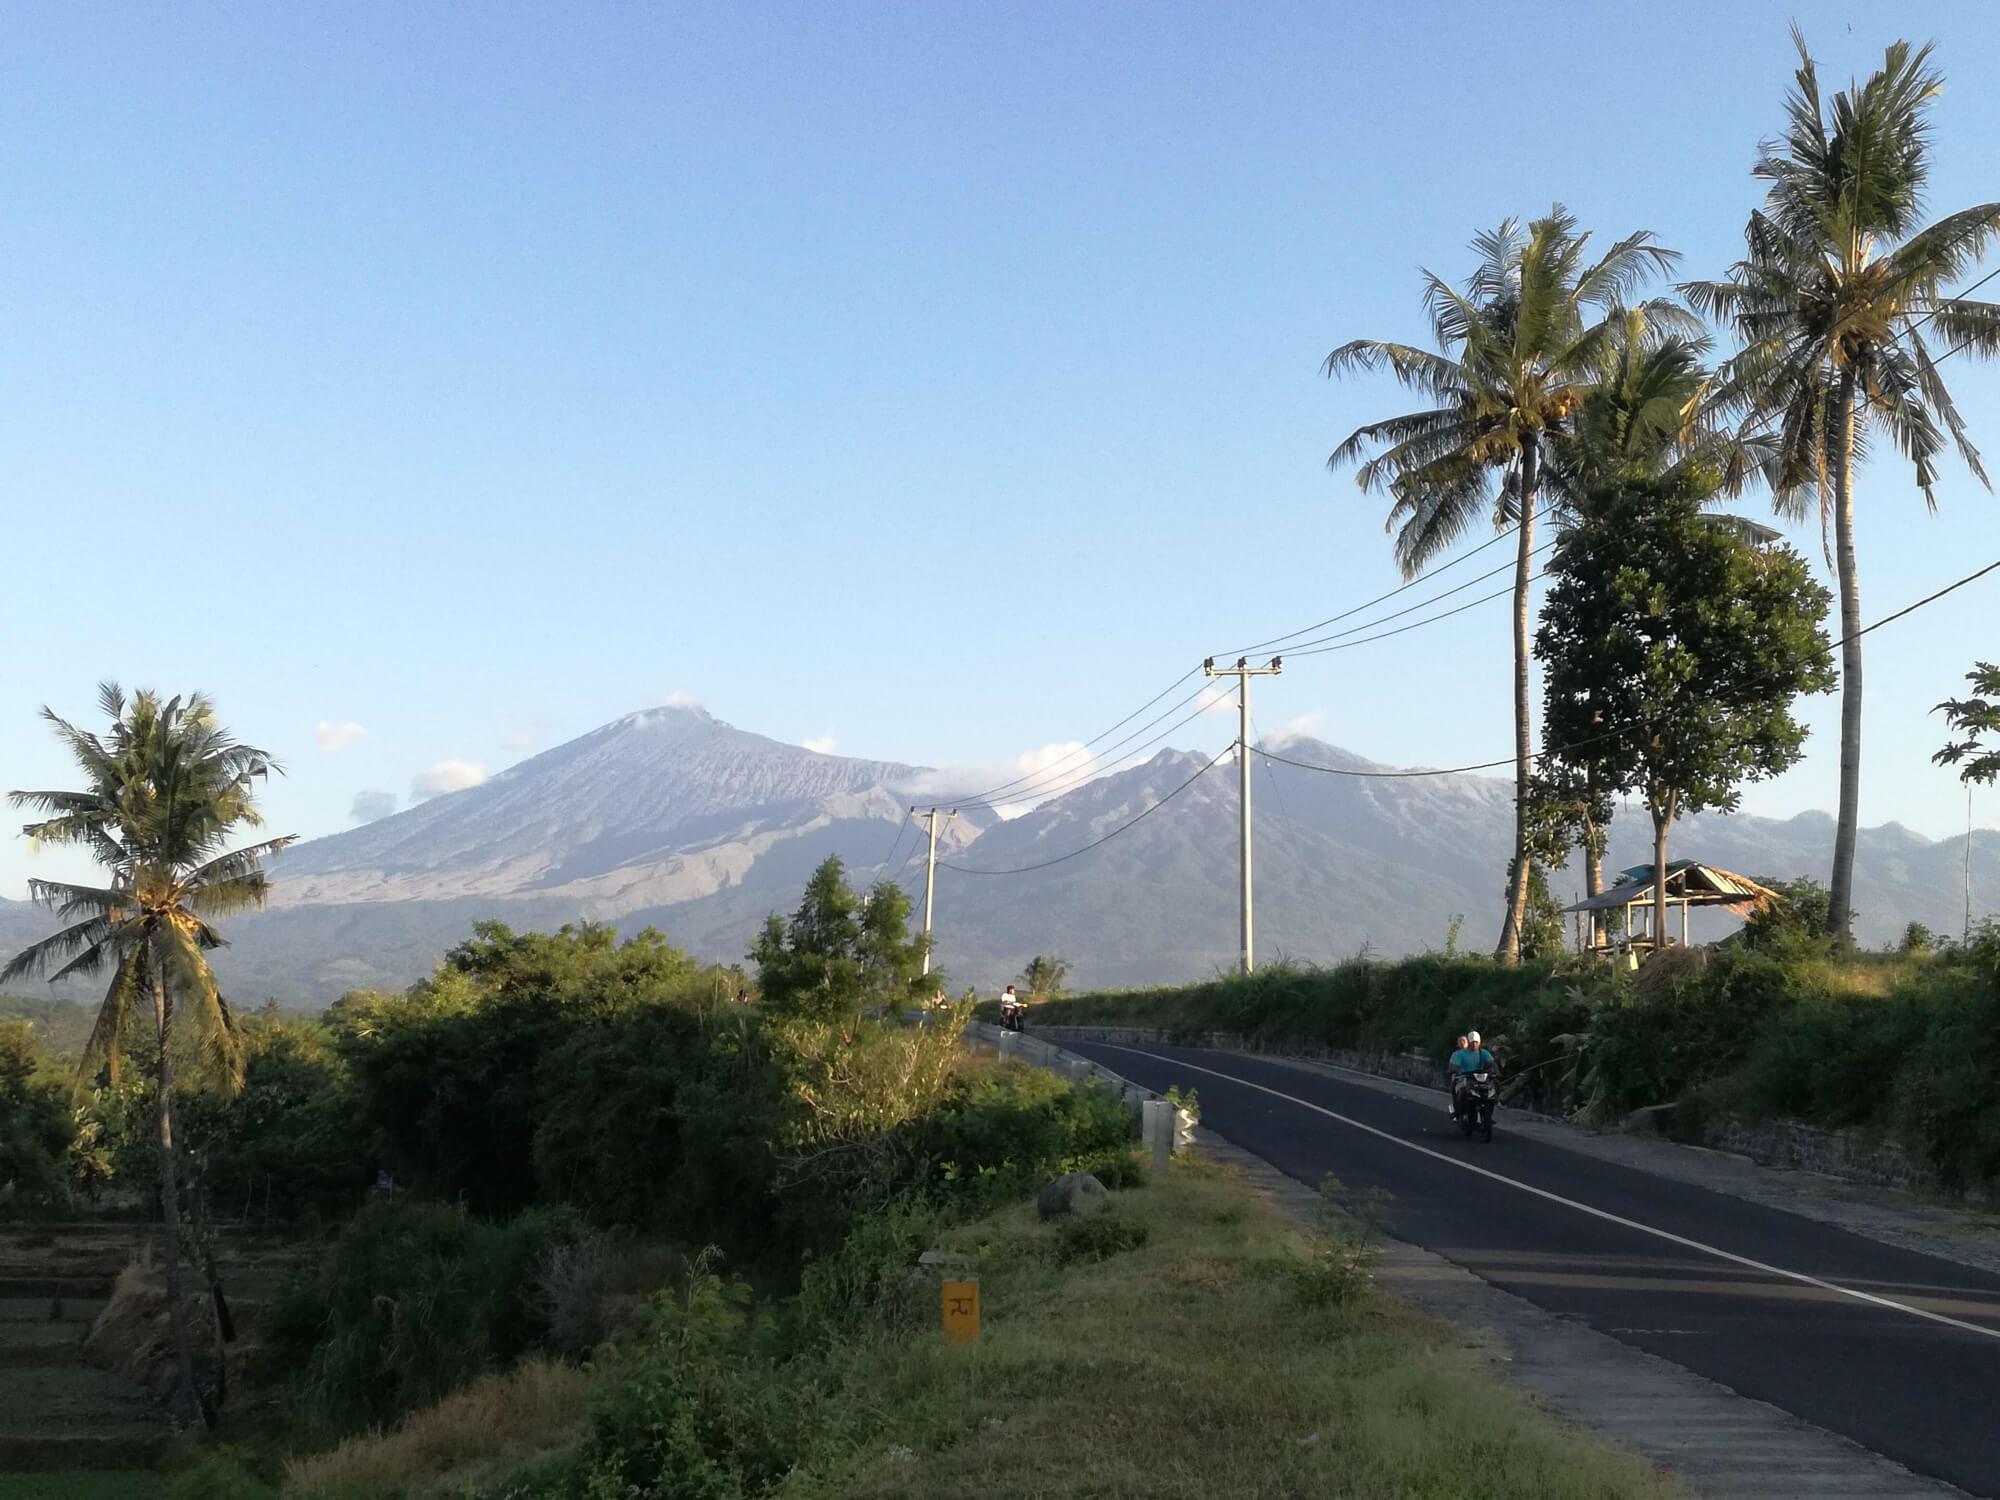 Lombok, Indonesië, reisverhaal, reisdagboek, reisblog, youngwildfree, Rinjani, Rinjani vulkaan beklimmen